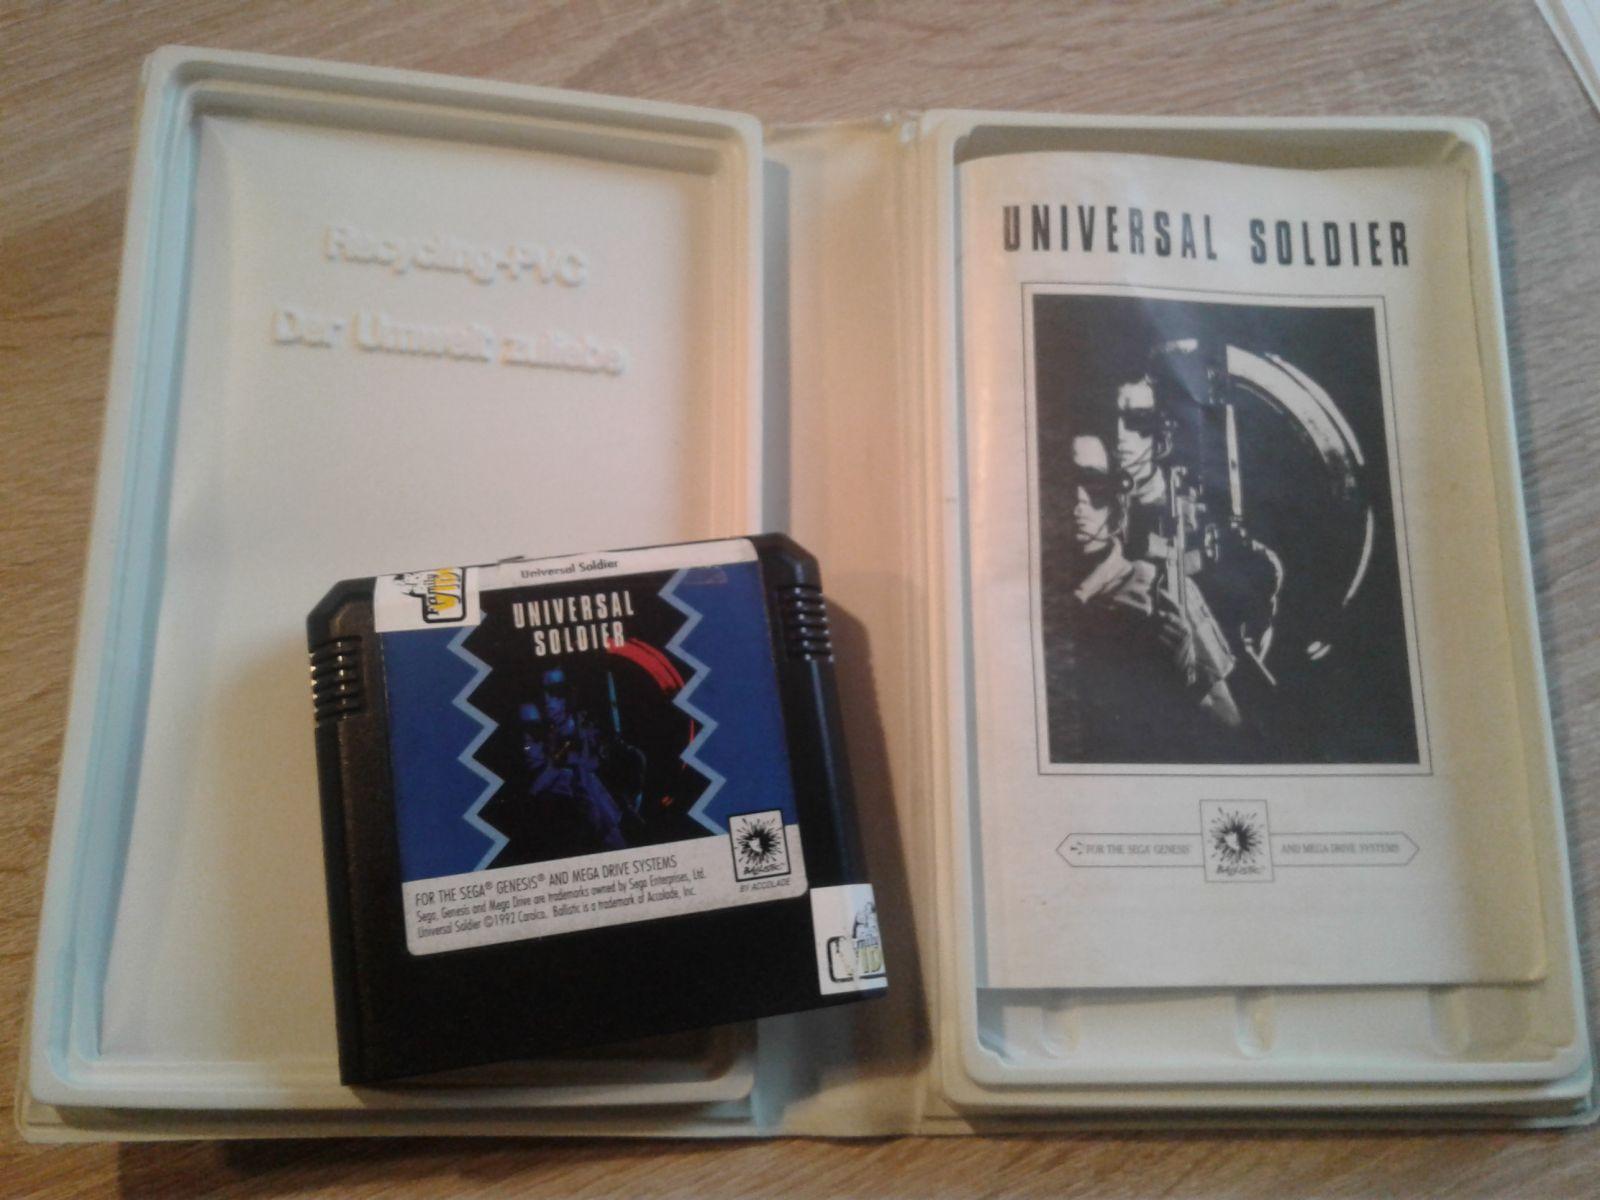 Universal Soldier Skirta Sega Mega Drive Konsolei